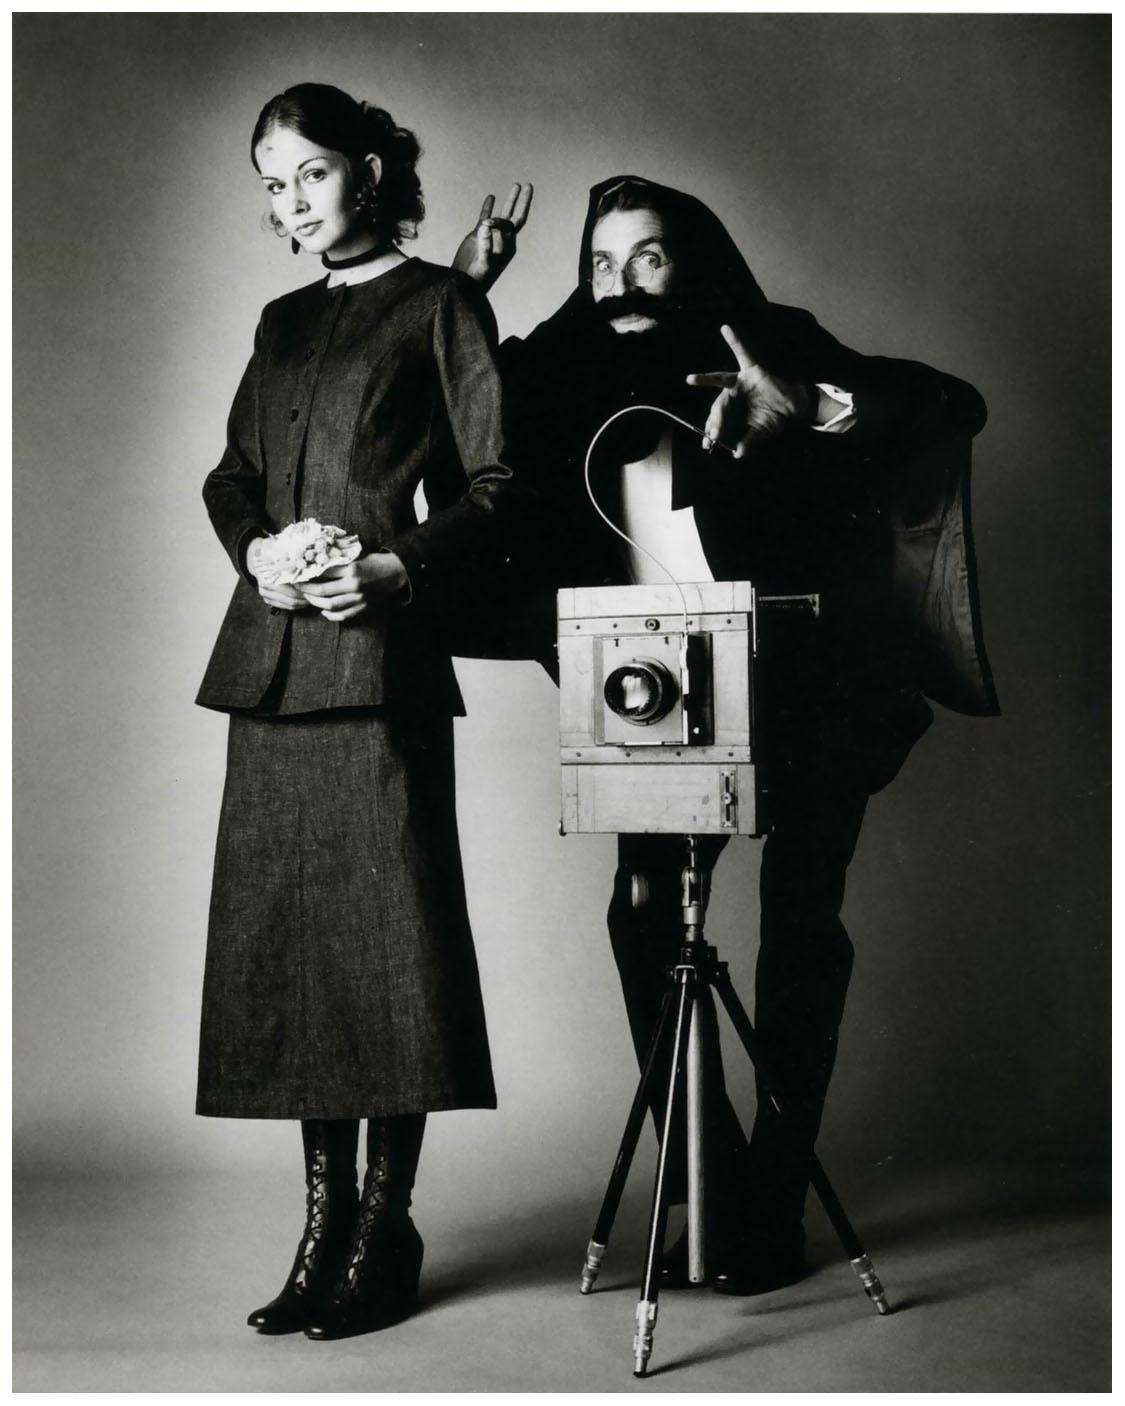 http://pleasurephoto.files.wordpress.com/2012/10/jeanloup-sieff-1960-selfportrait.jpg